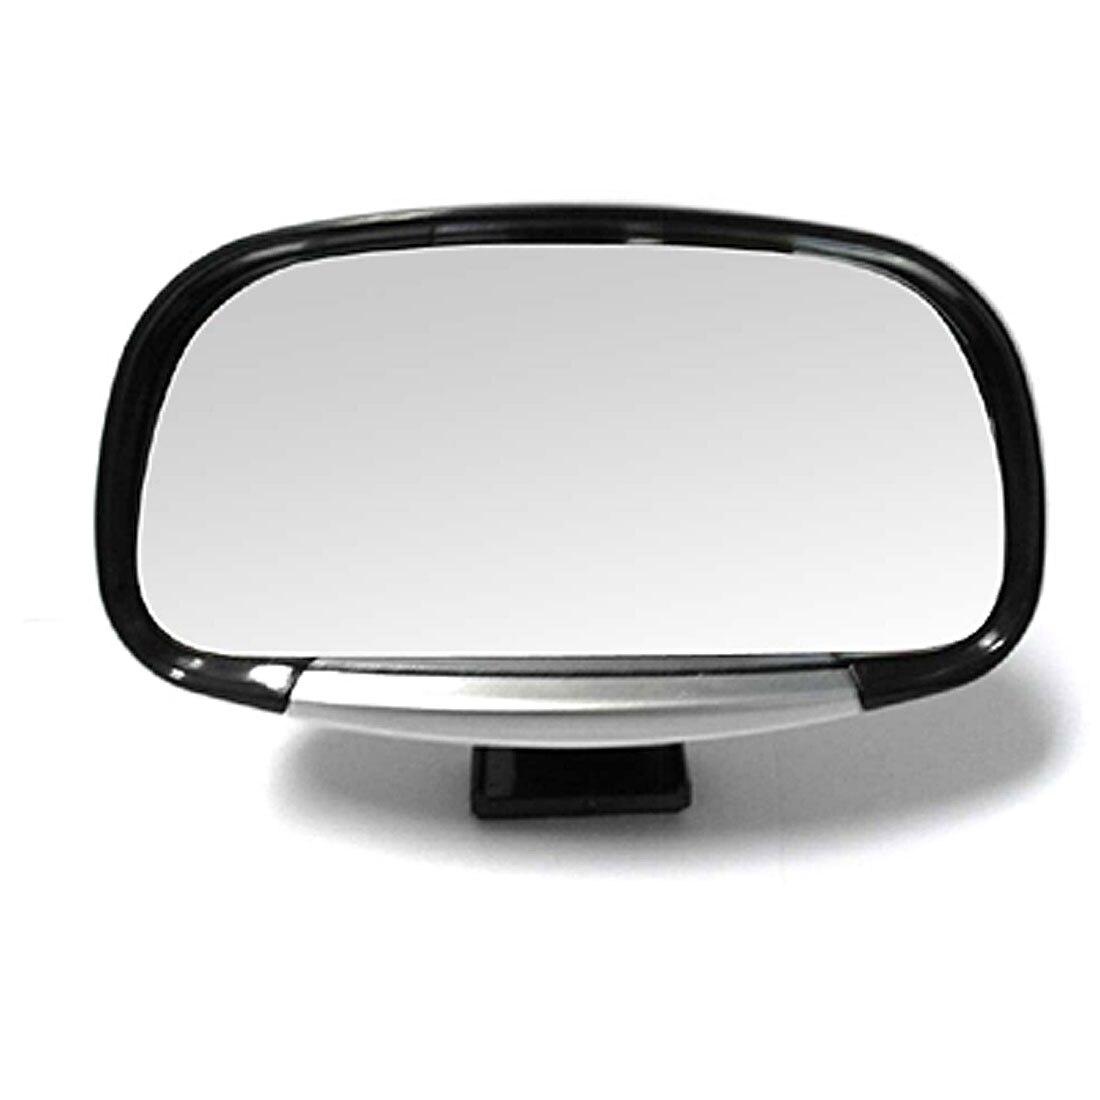 UXCELL Revolving Convex Car Rear View Blind Spot Mirror Black (3R-081)